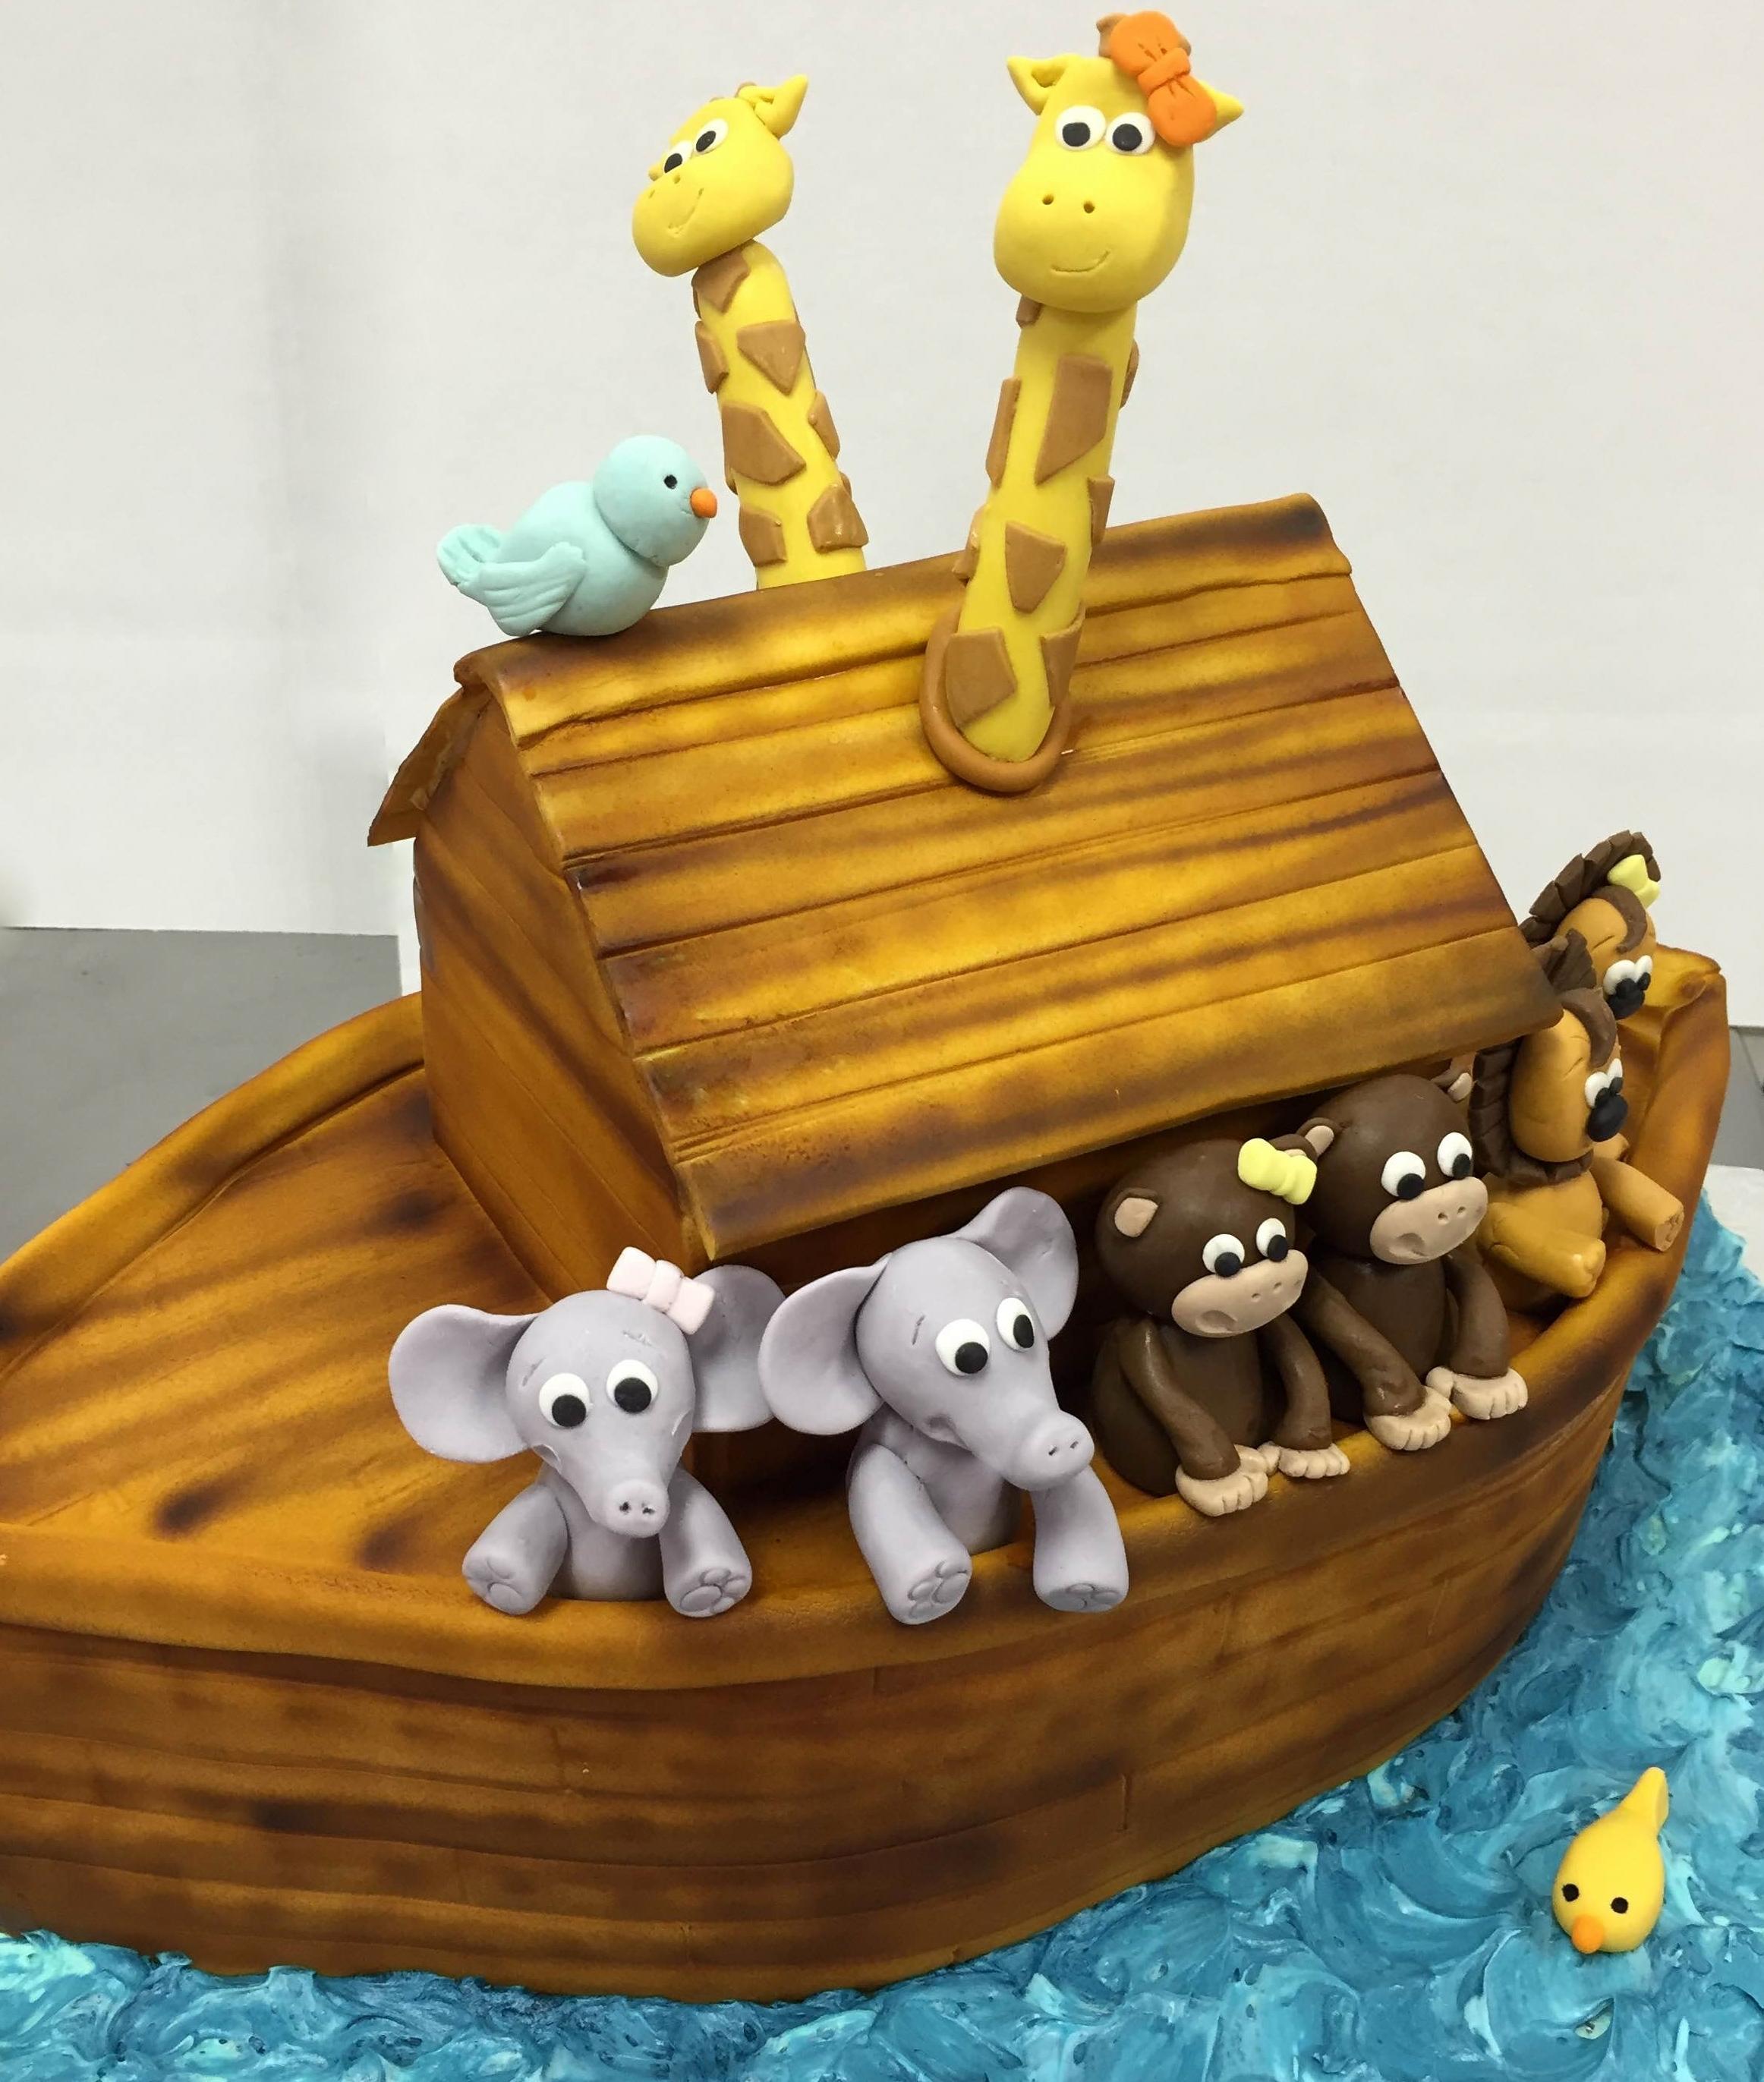 noahs ark with giraffe heads.JPG